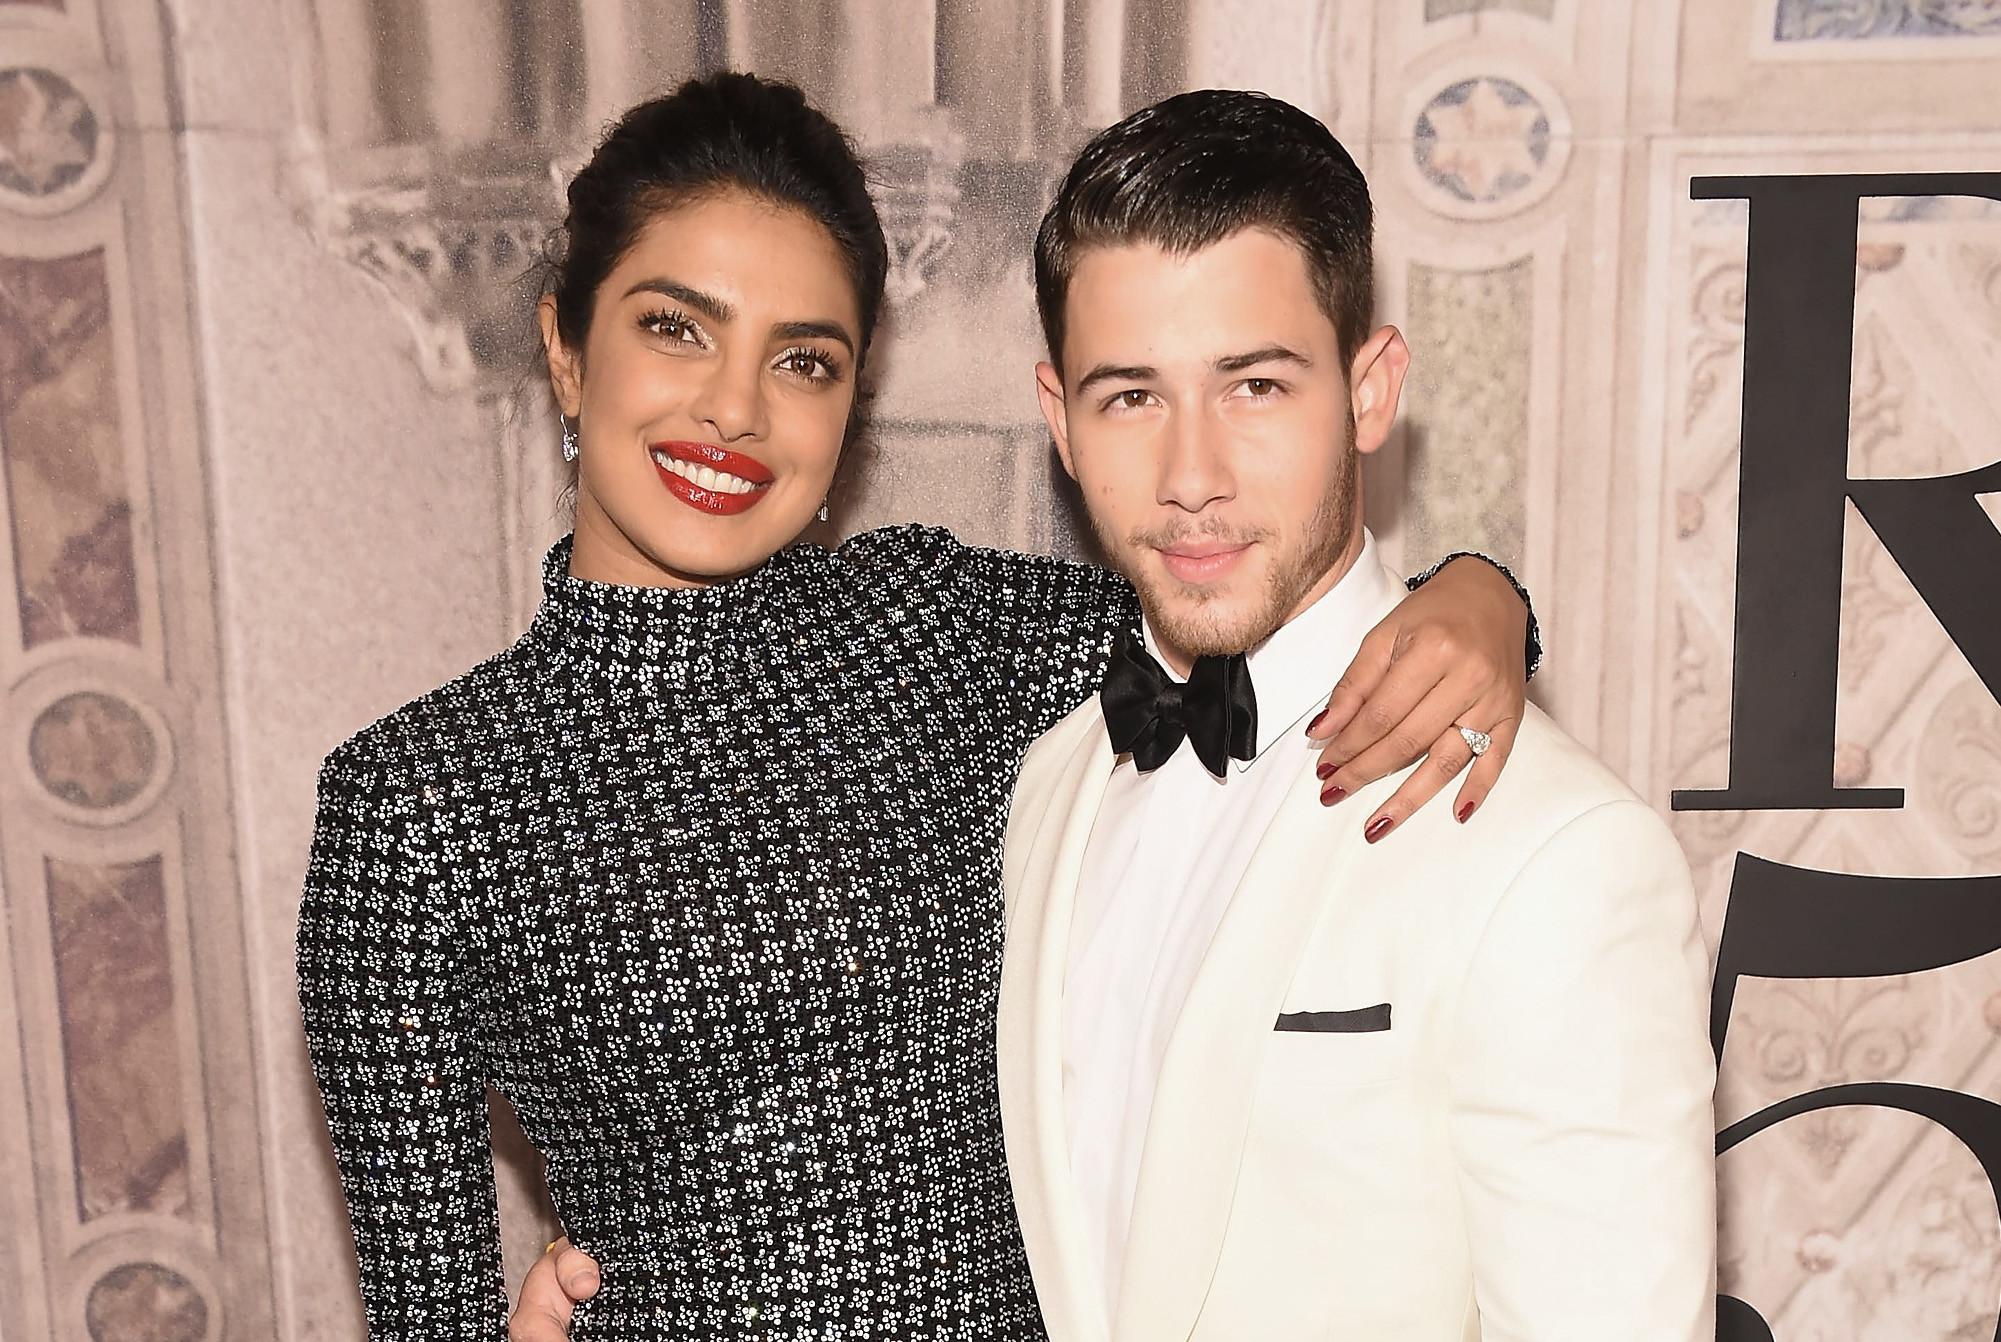 Emotions ran 'high' during Nick Jonas and Priyanka Chopra's wedding